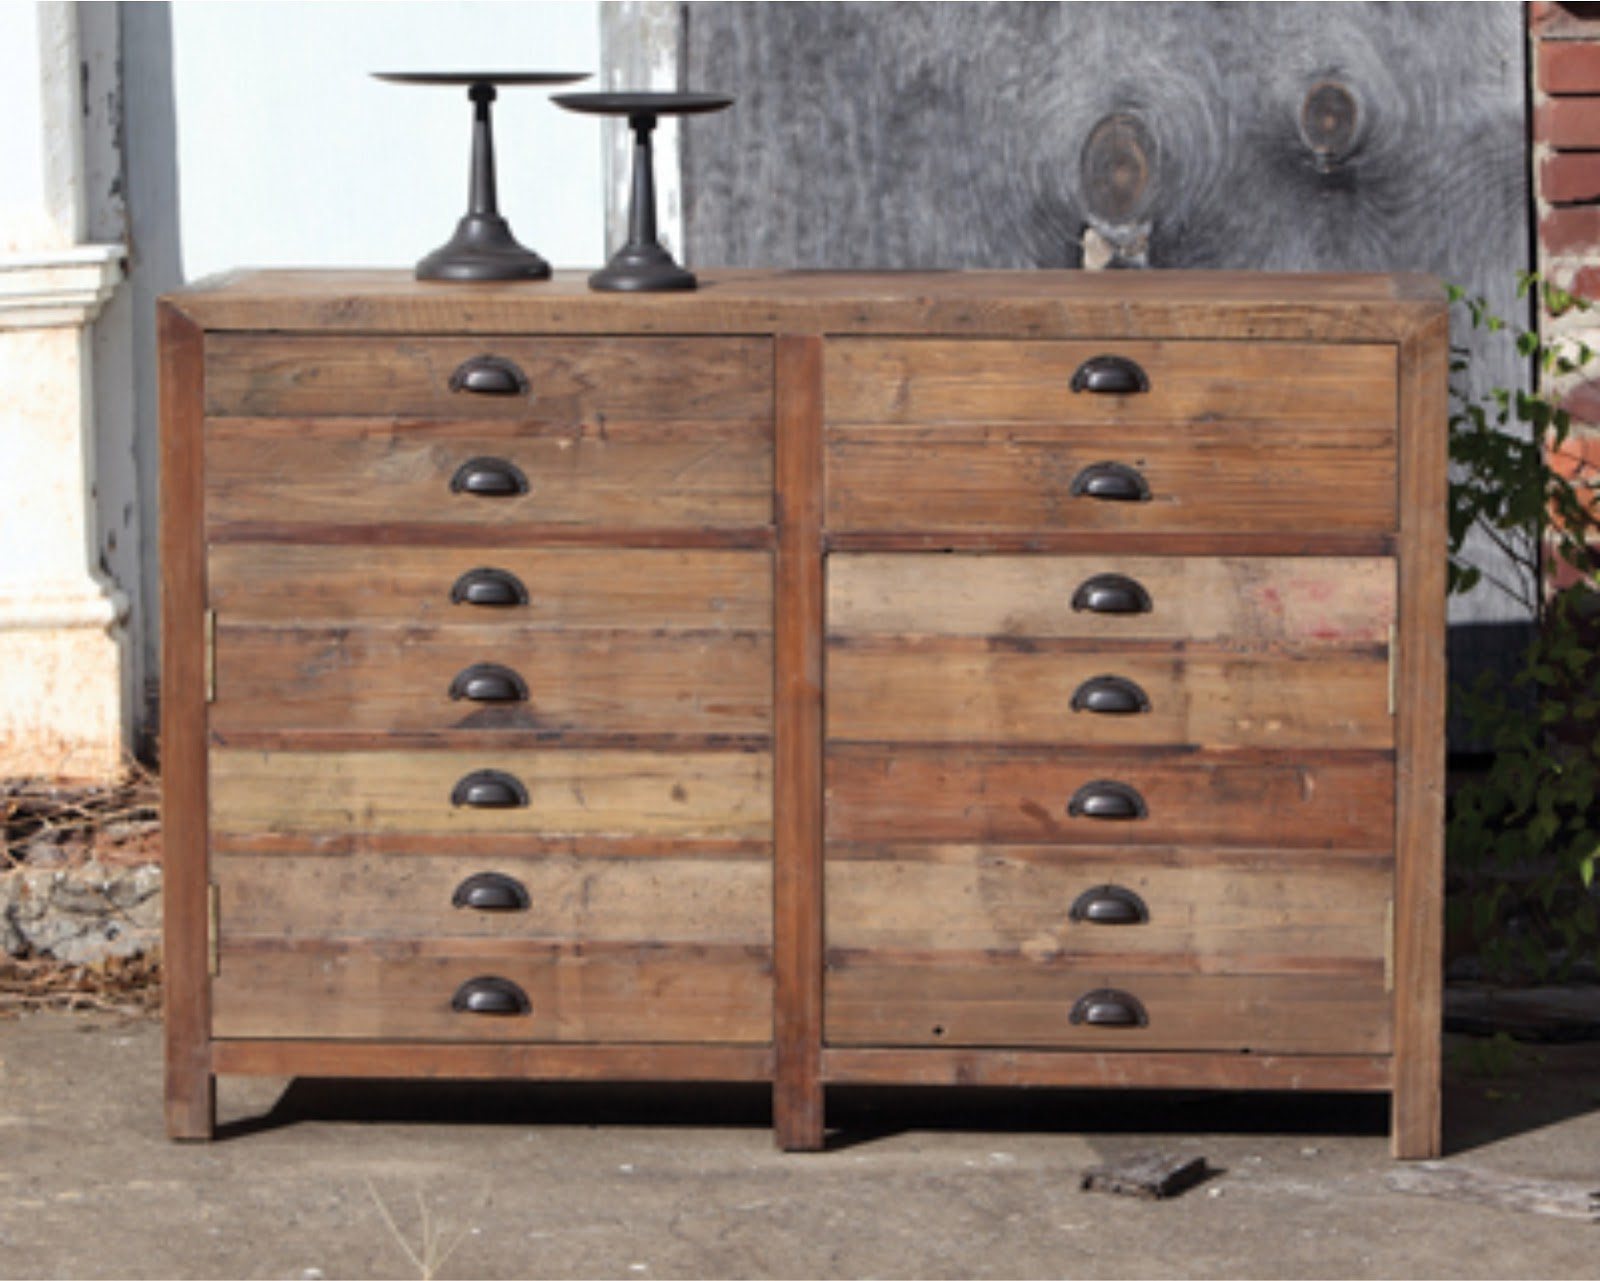 j thaddeus ozark 39 s cookie jars and other larks cabinets with a secret. Black Bedroom Furniture Sets. Home Design Ideas